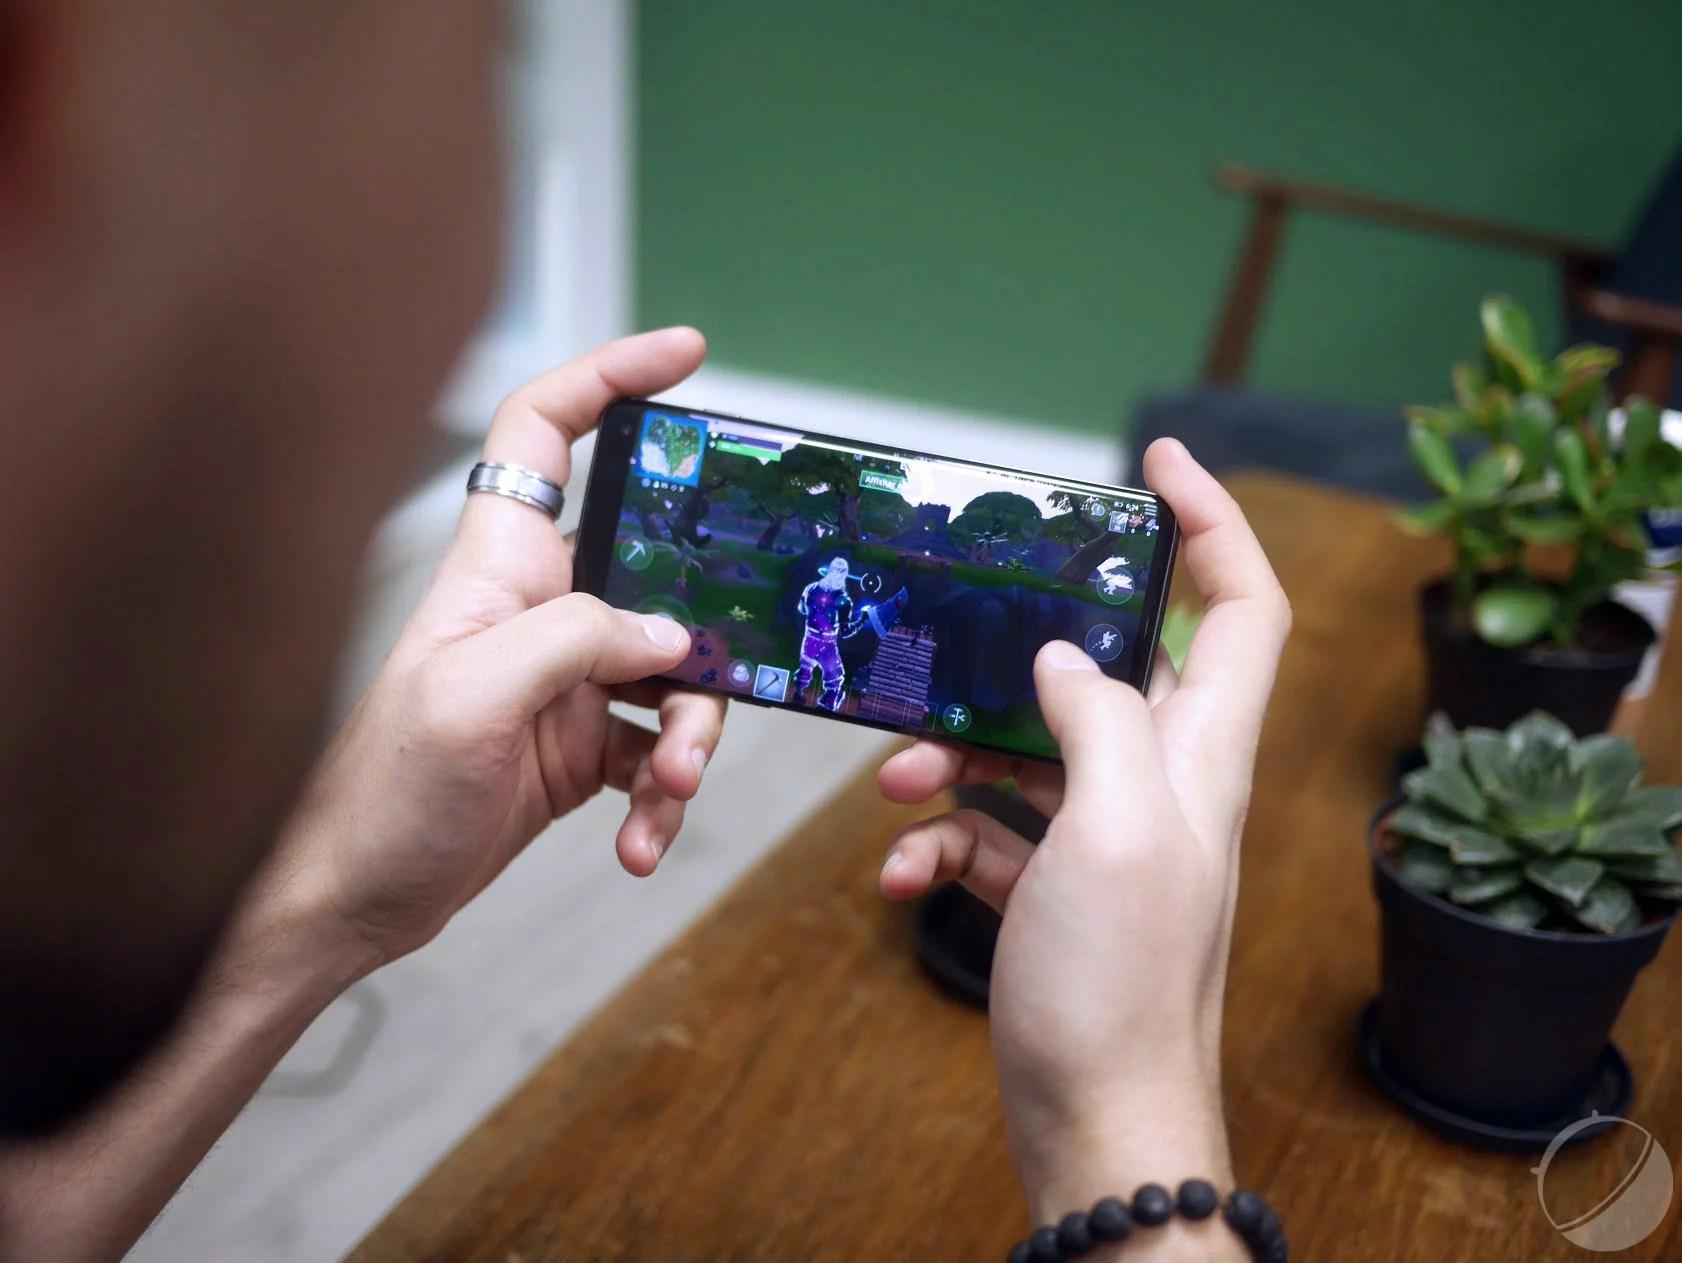 Samsung et AMD : les smartphones Galaxy utiliseront des puces Radeon